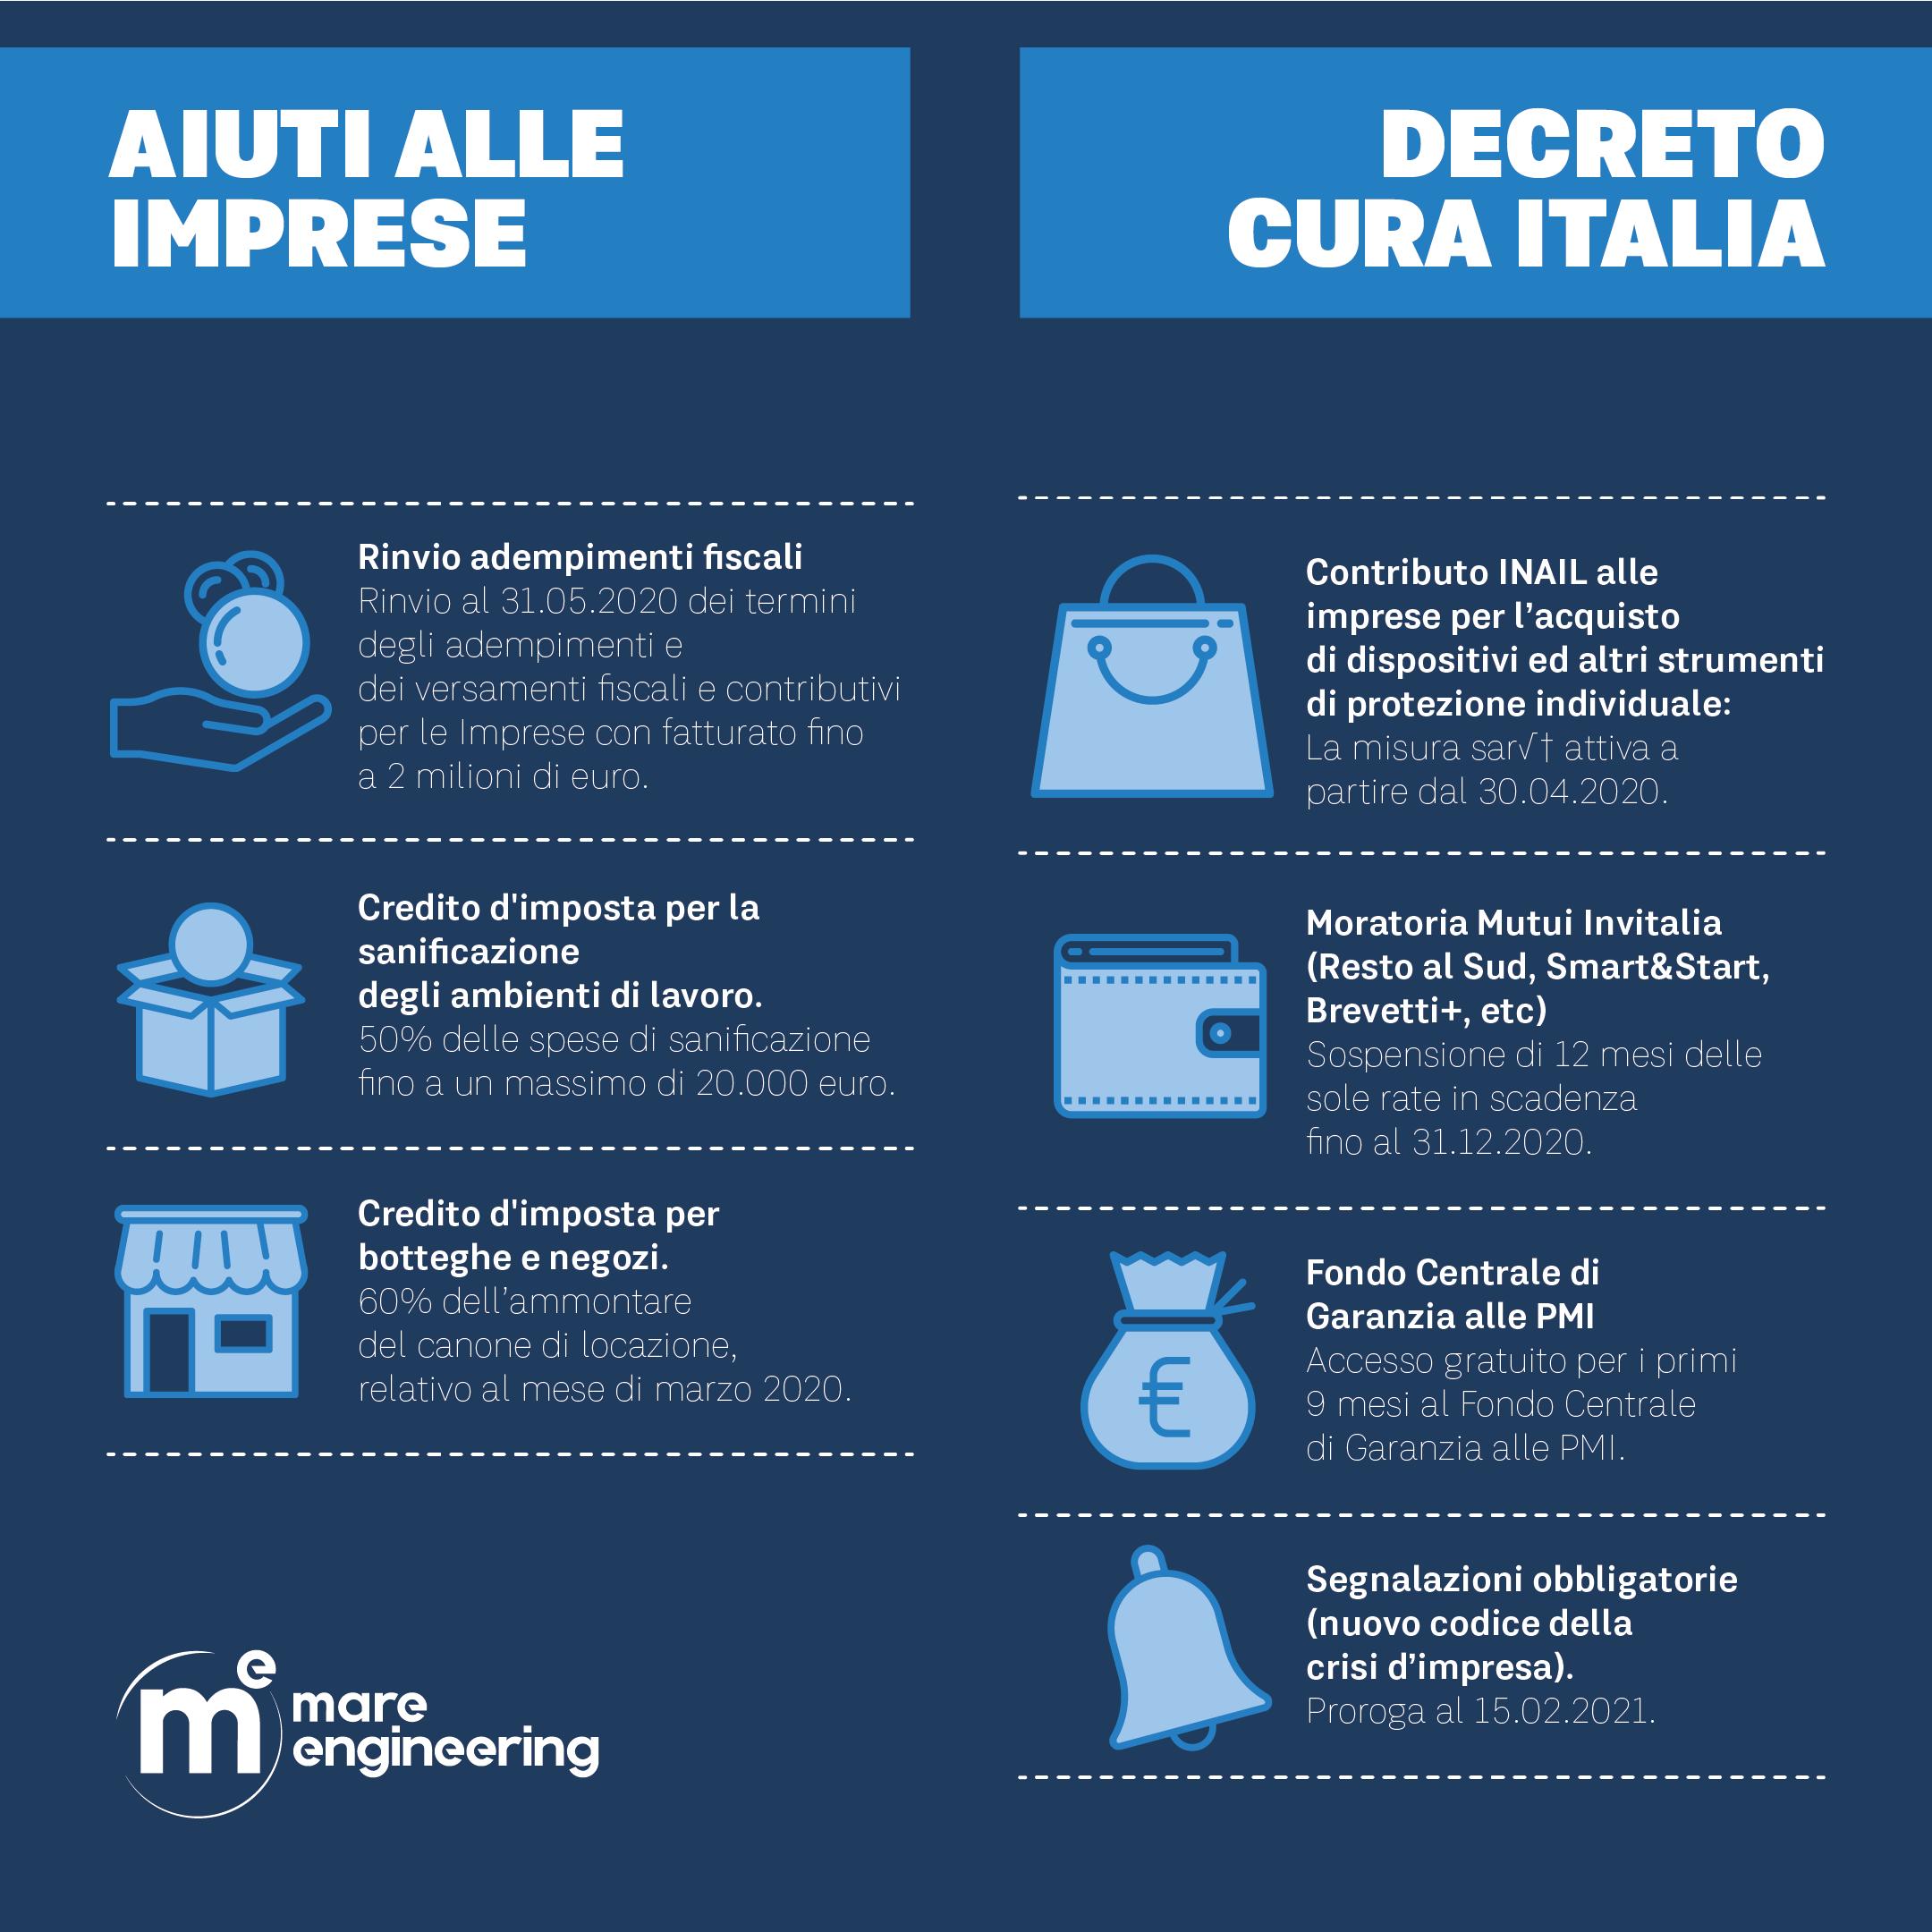 Decreto Cura Italia Aiuti alle imprese